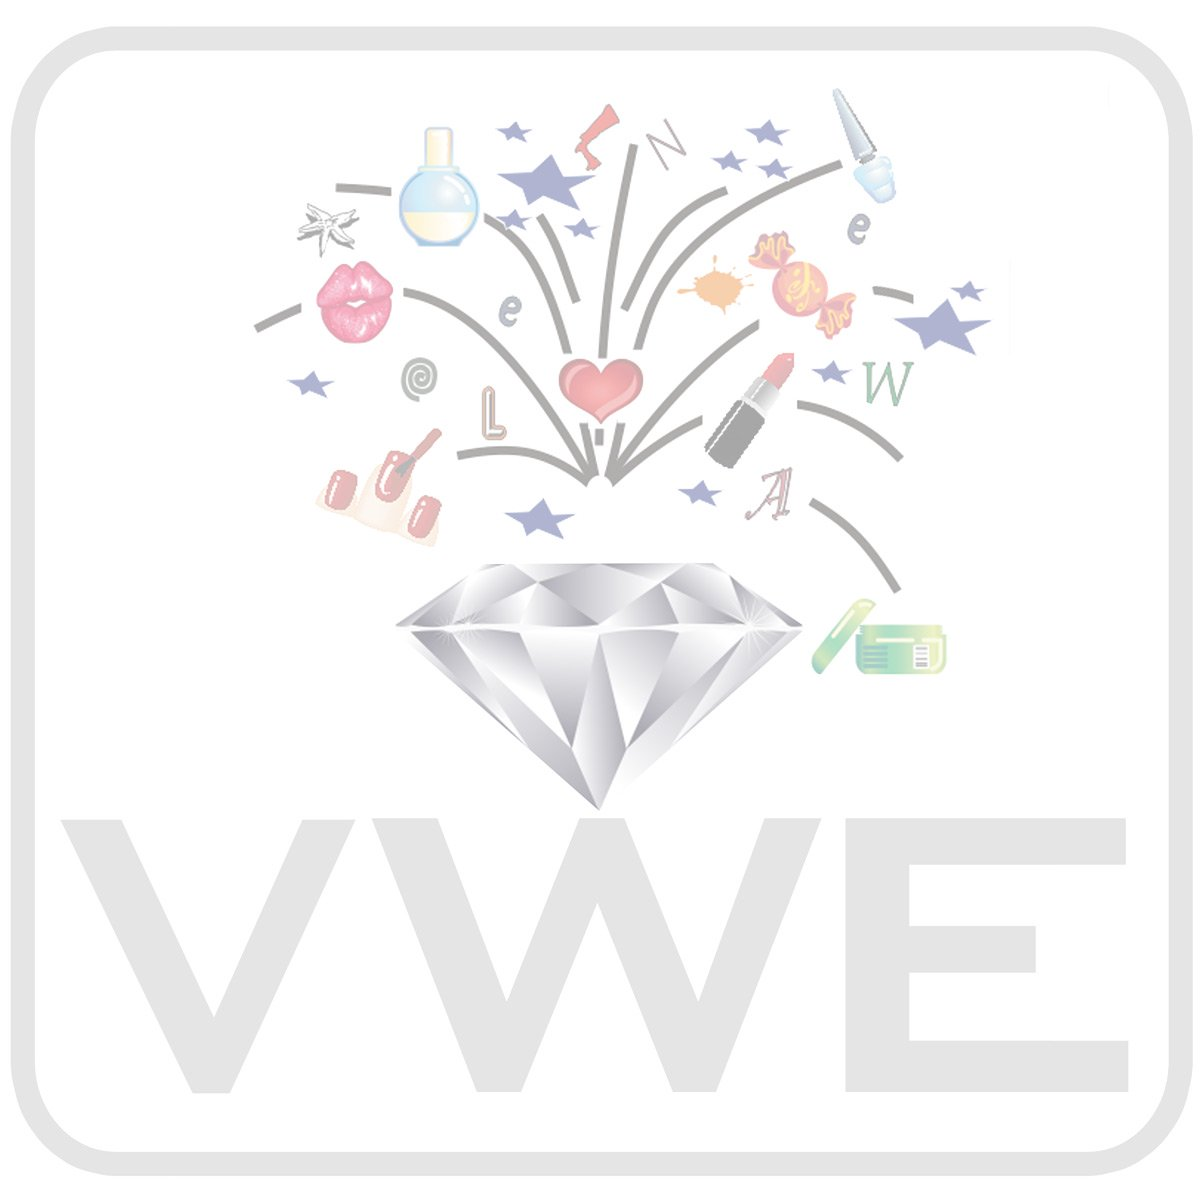 UV Gel Flux Diamond Touch Colour Pop Art - 5ml  [9 / 12]